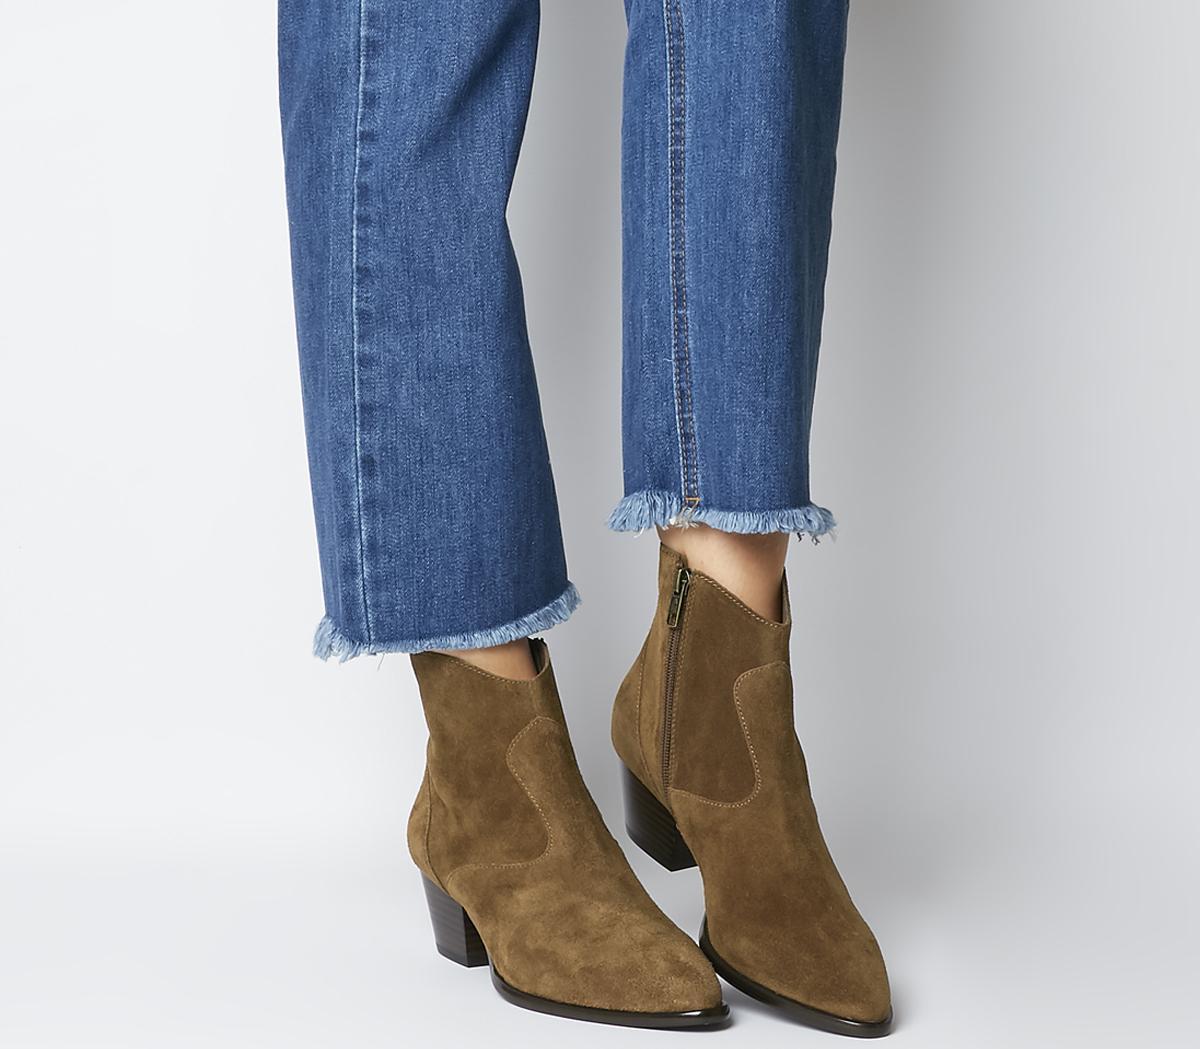 Heidi Bis Ankle Boots